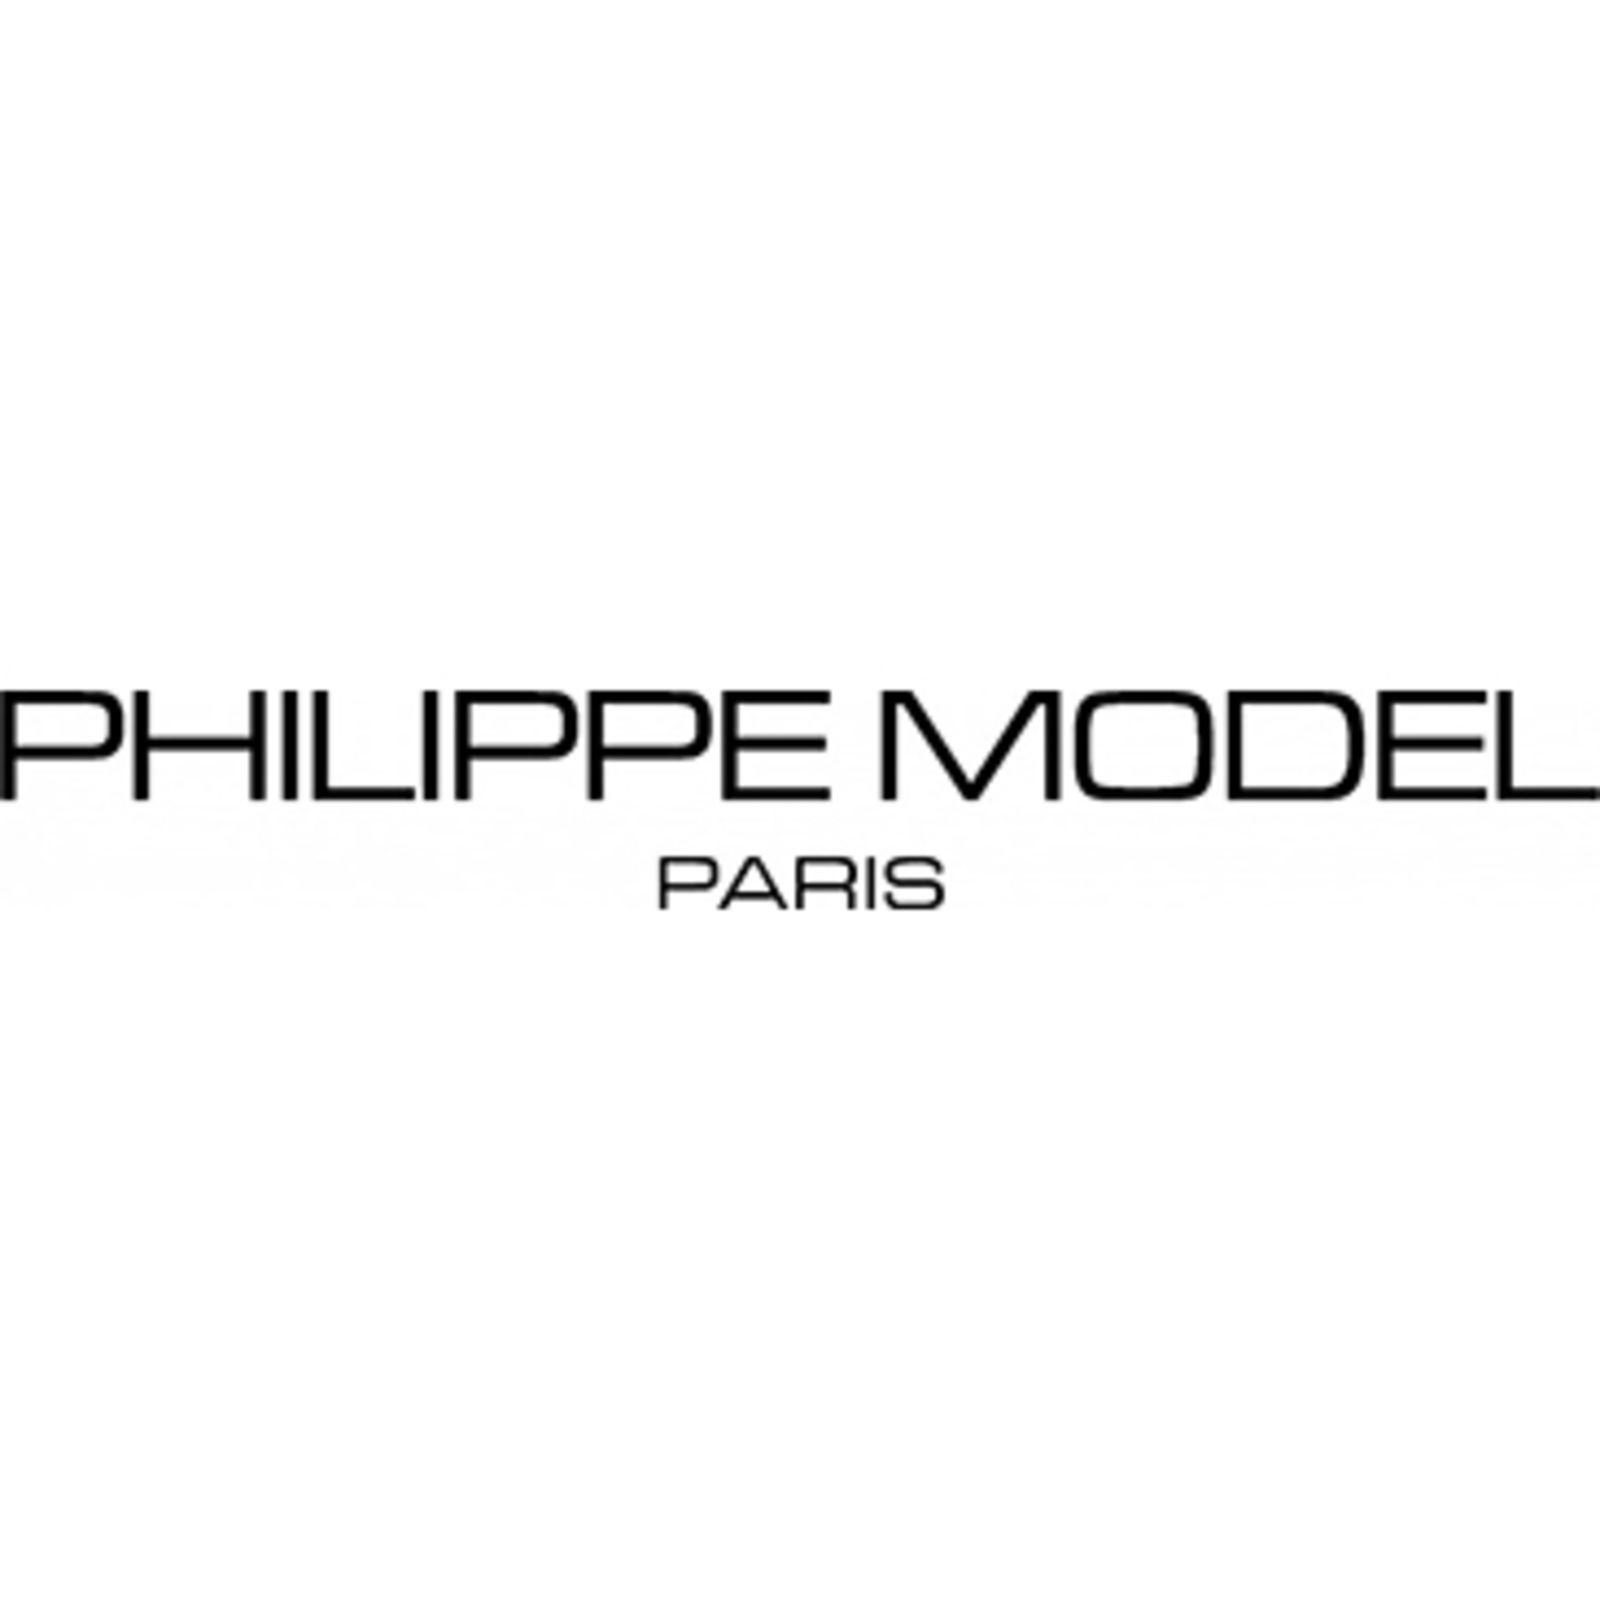 PHILIPPE MODEL (Image 1)